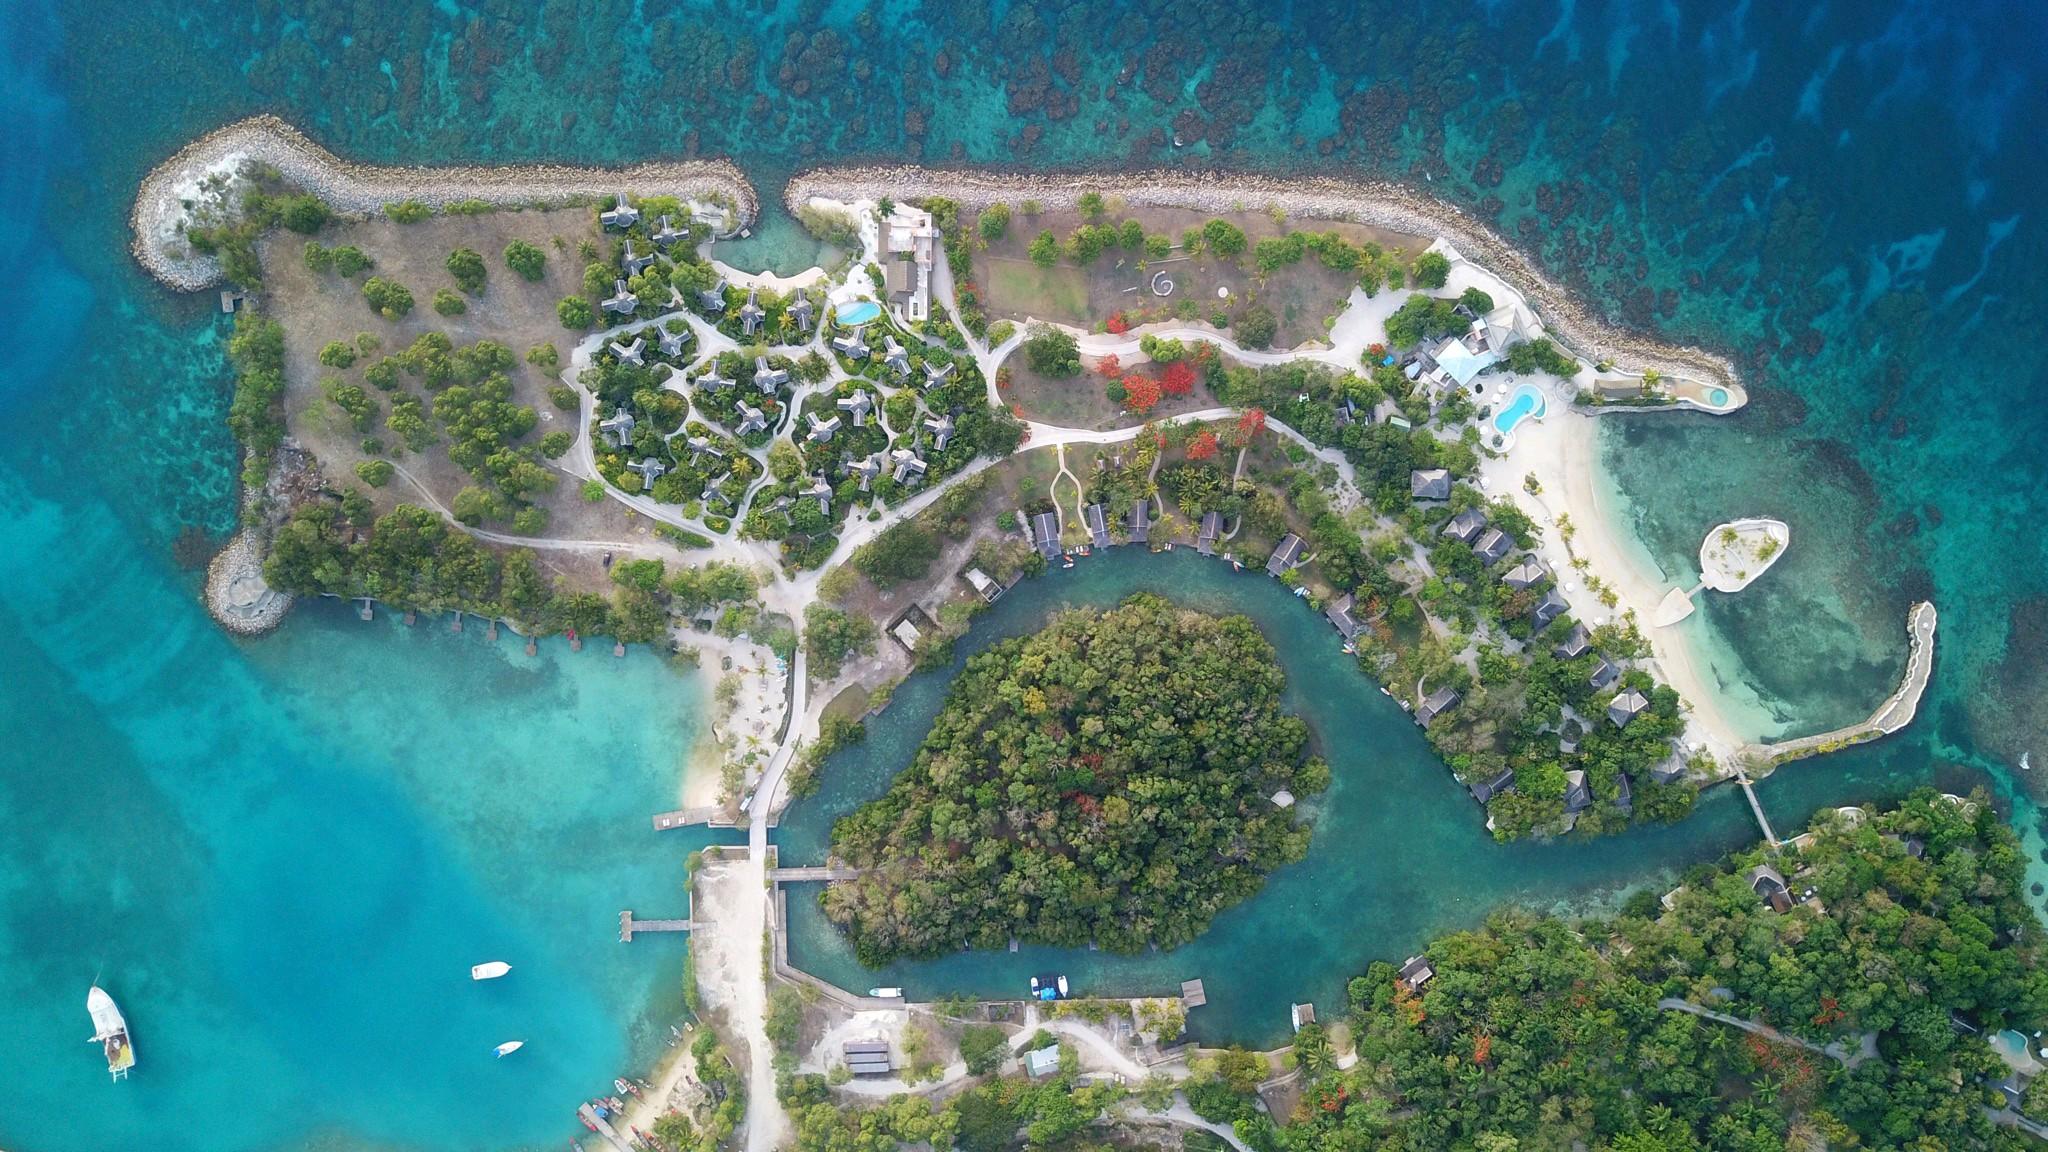 Island Drone